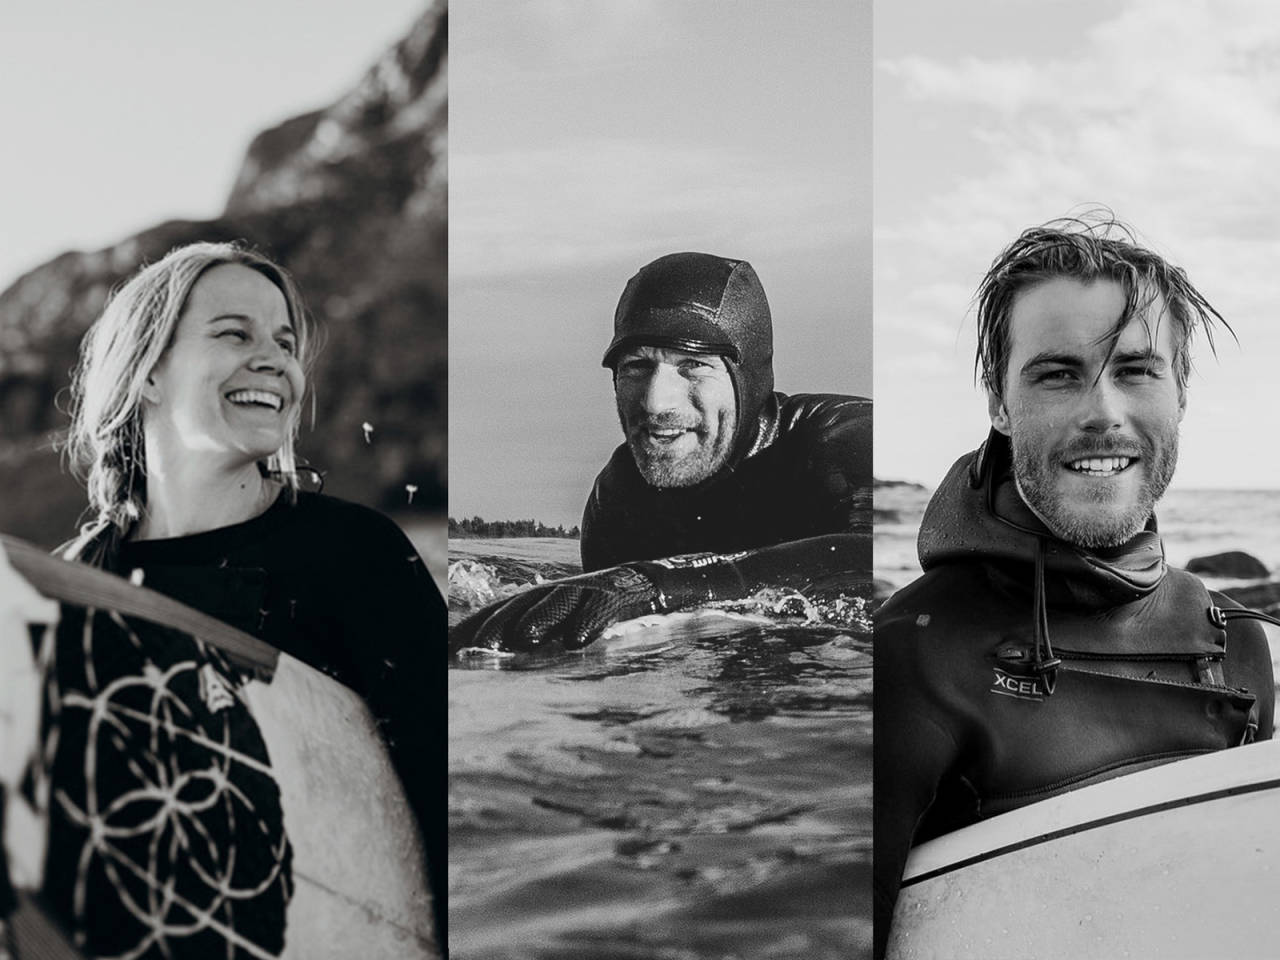 Kathrine Røed Ståle Sandbech Jonas Paulsen Saltstein Surf